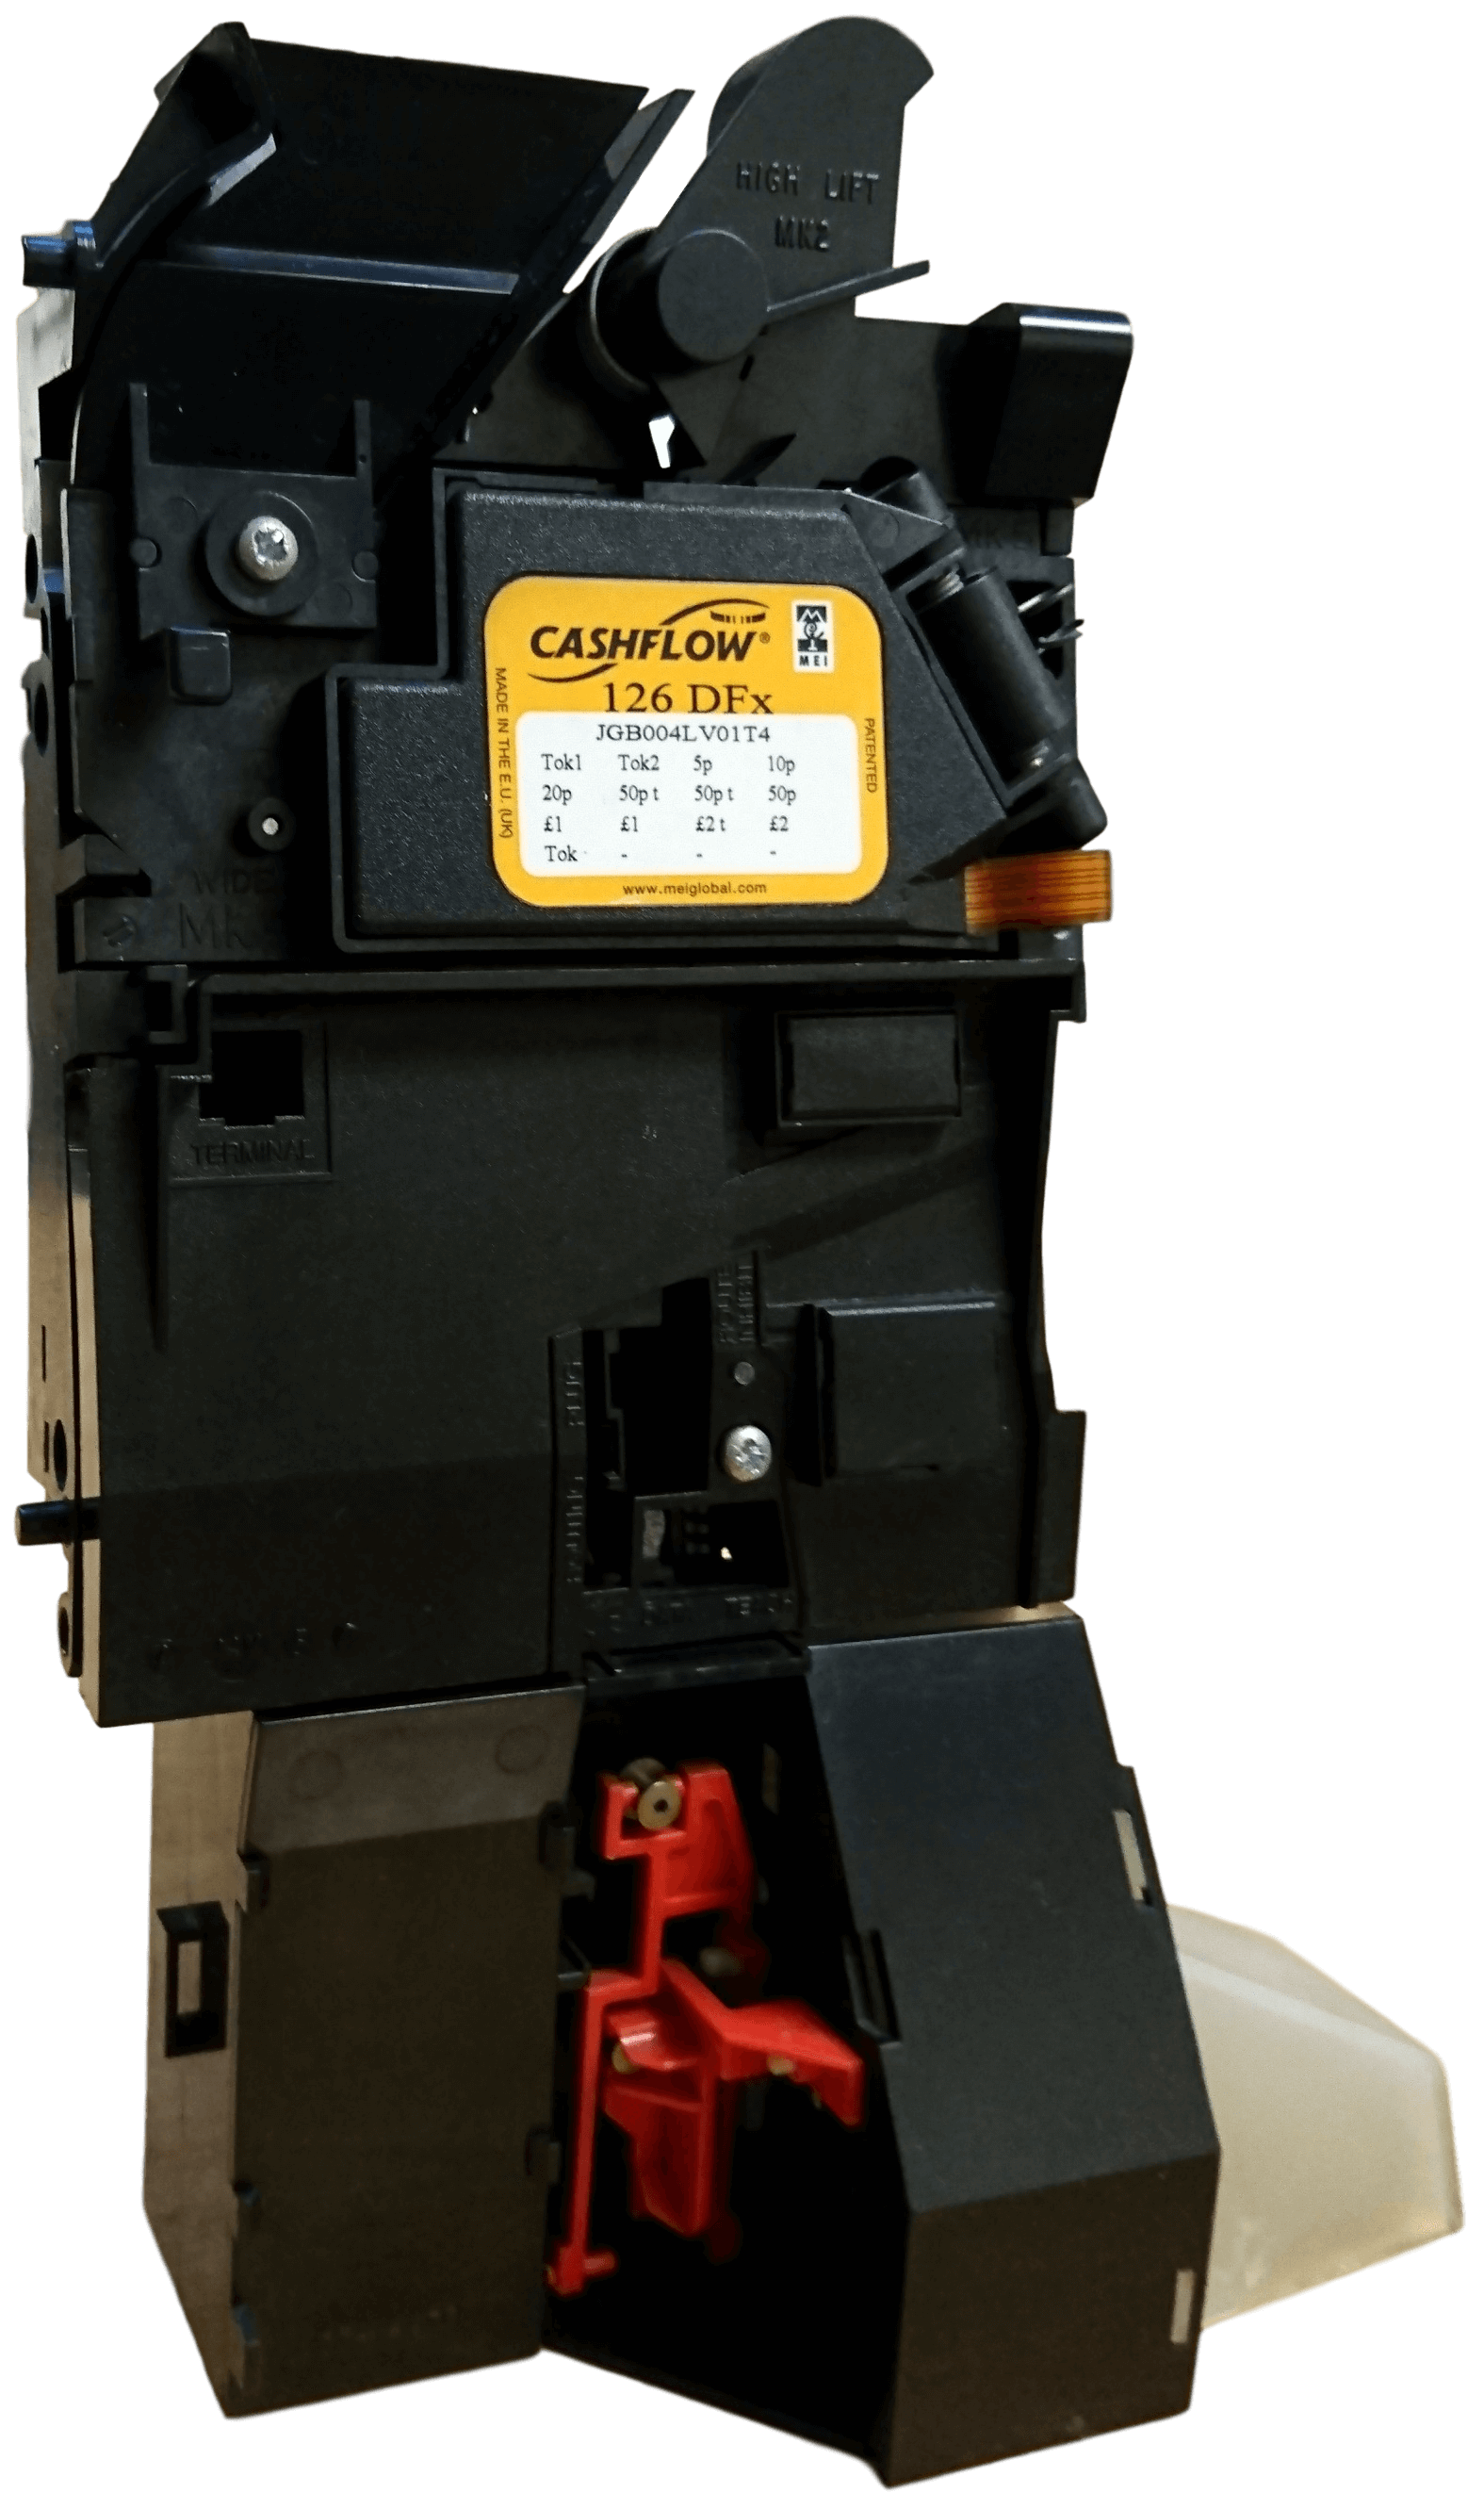 Cashflow 126 DFX Parallel / Binary Coin Mechanism